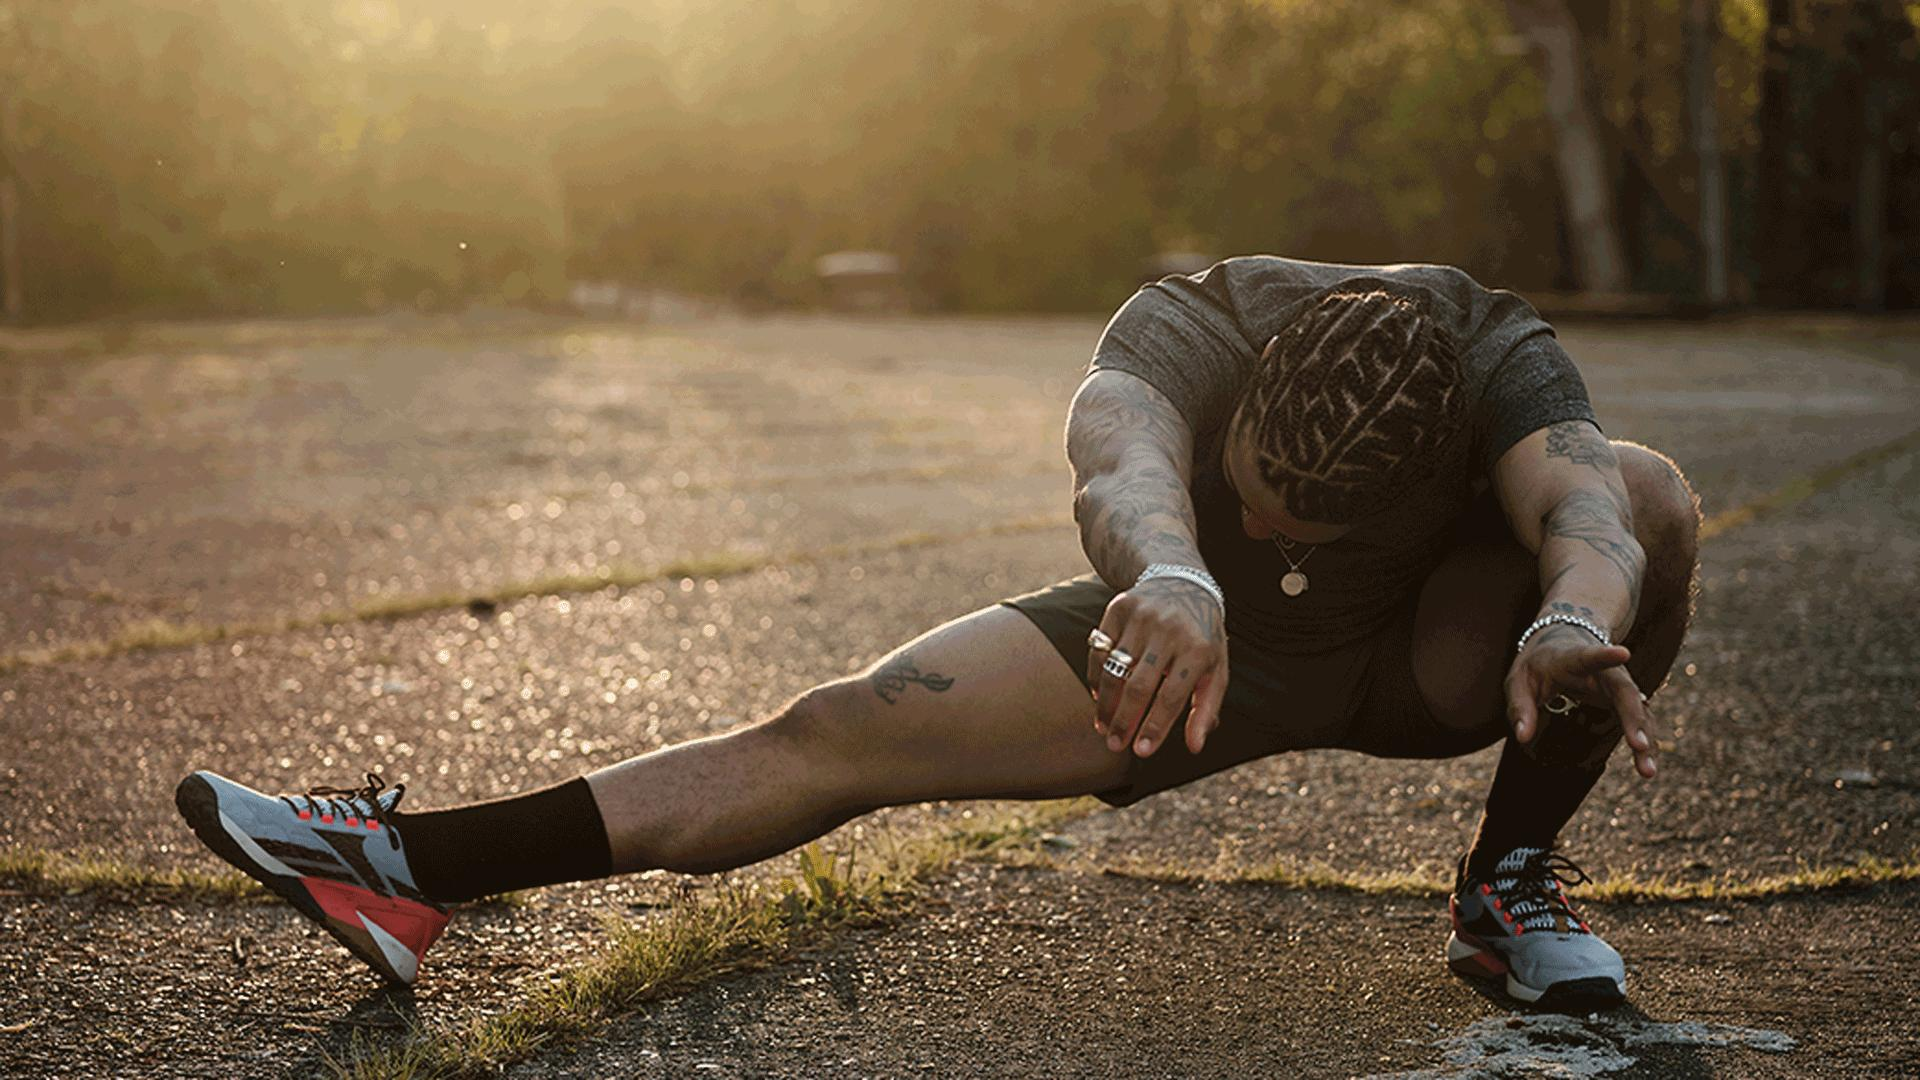 Reebok's Nano X1 Adventure training shoe | An athlete exercising outdoors